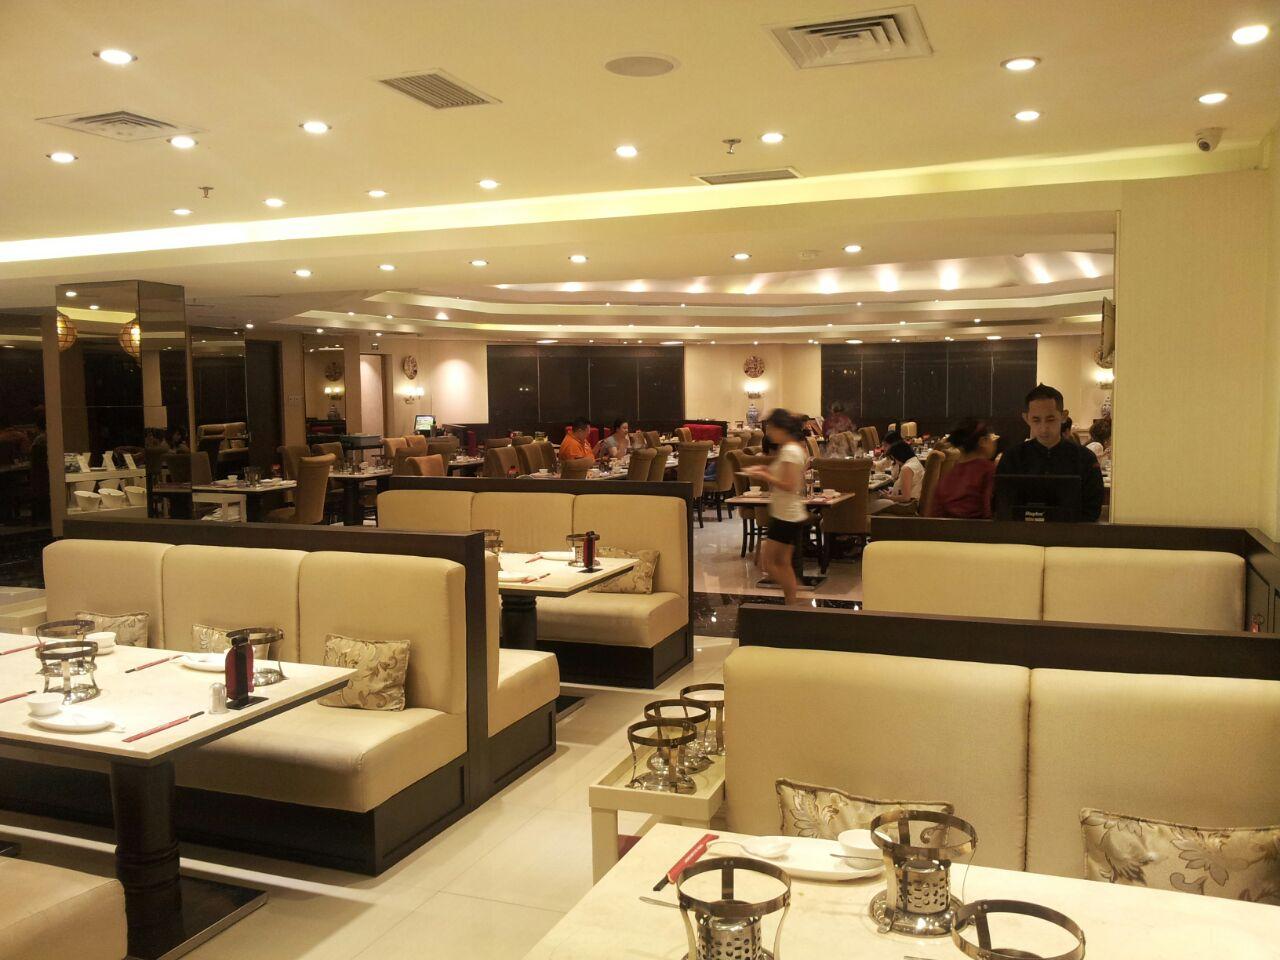 Restoran elegan lengkap dengan sofa yang mewah